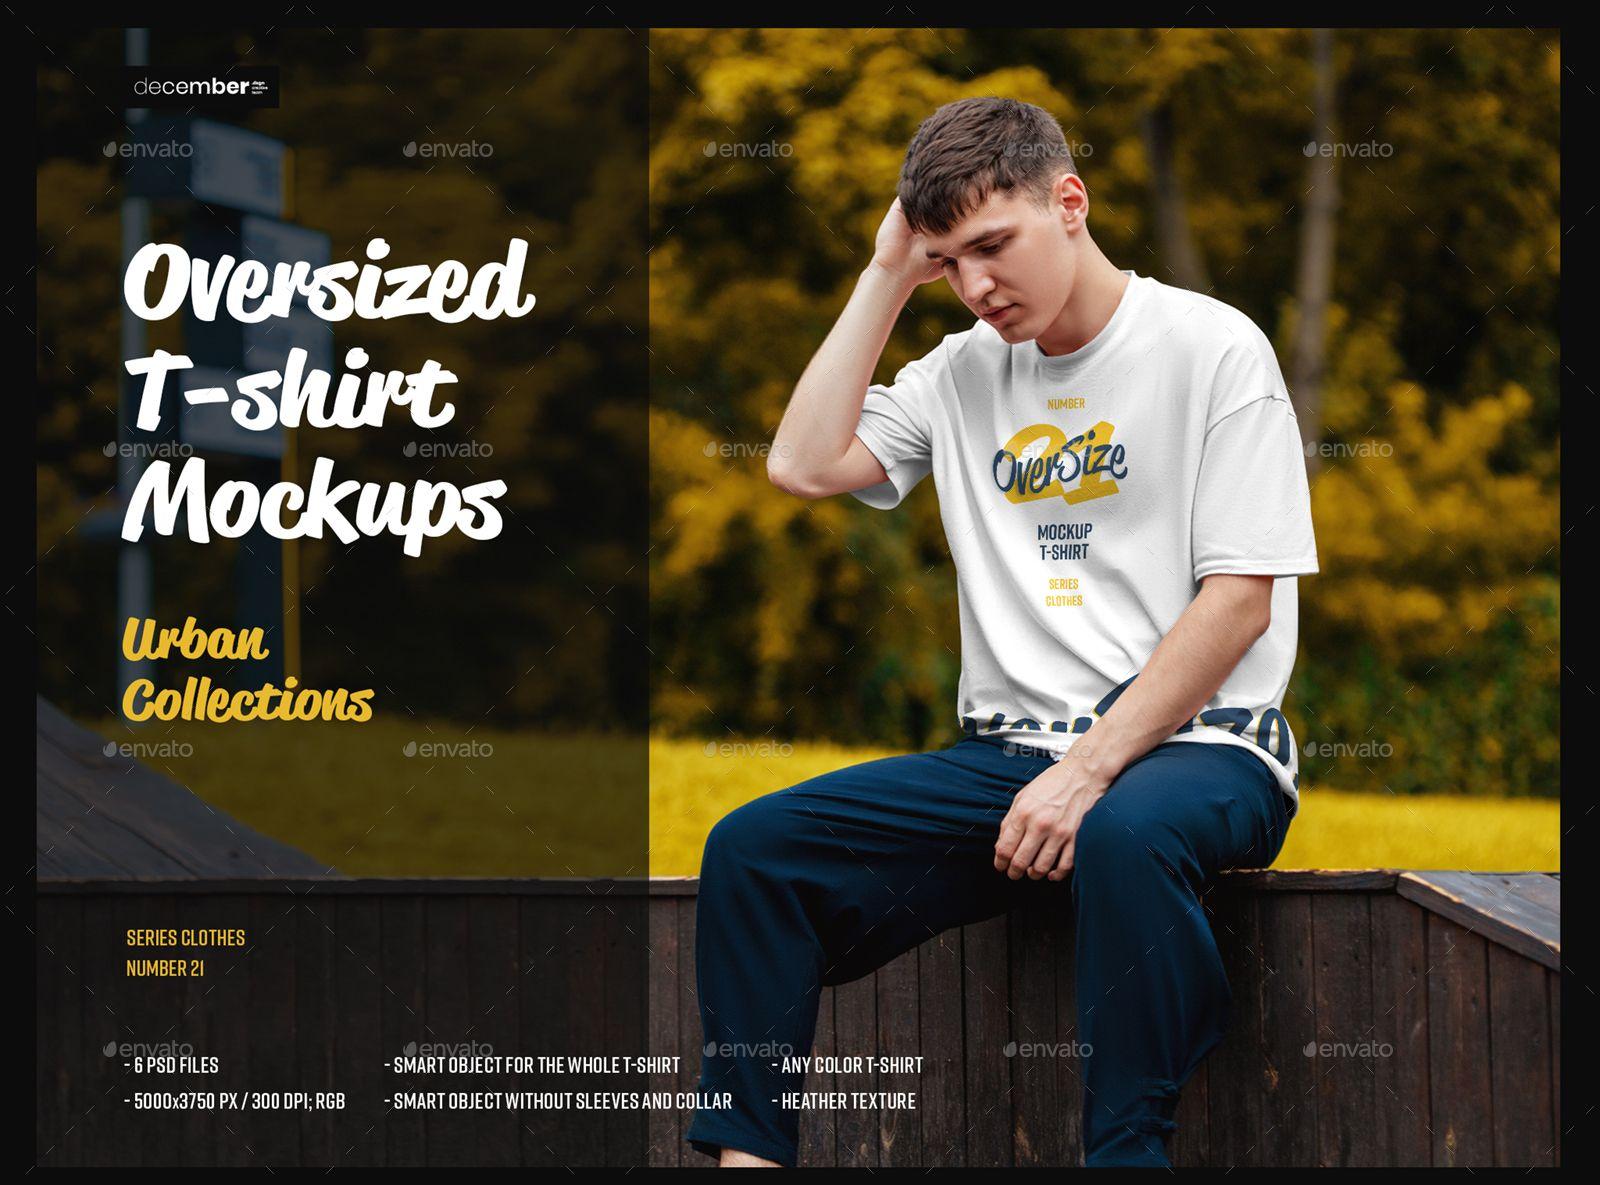 Download 6 Oversized T Shirt Mockup Urban Style In 2020 Shirt Mockup Oversized Tshirt Tshirt Mockup